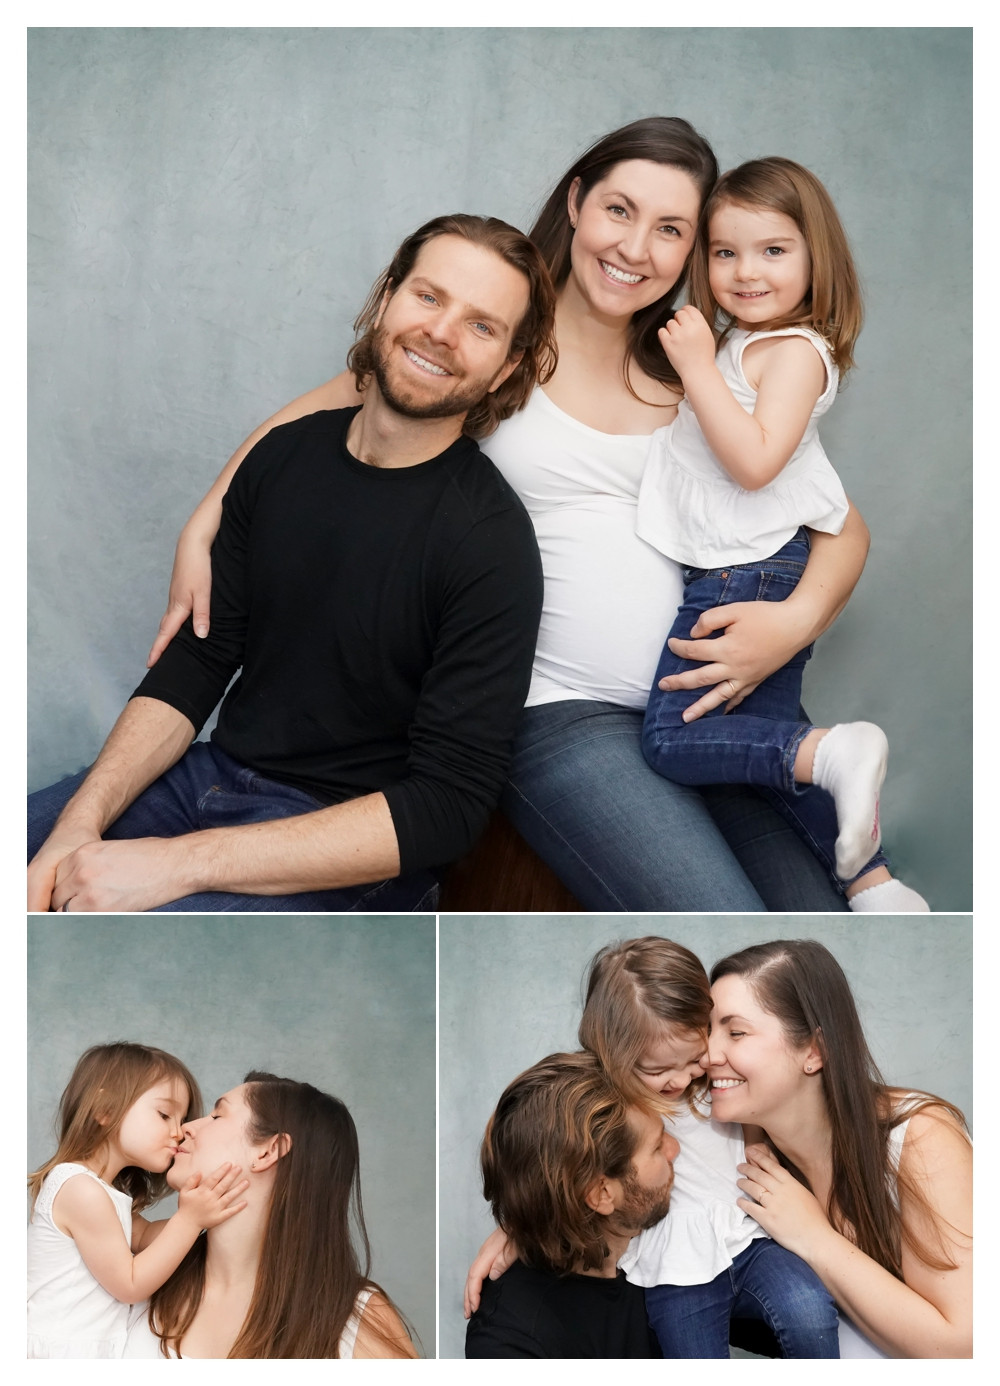 Maternity Portrait - Kelly VanderBeek - Canmore Banff based photographer